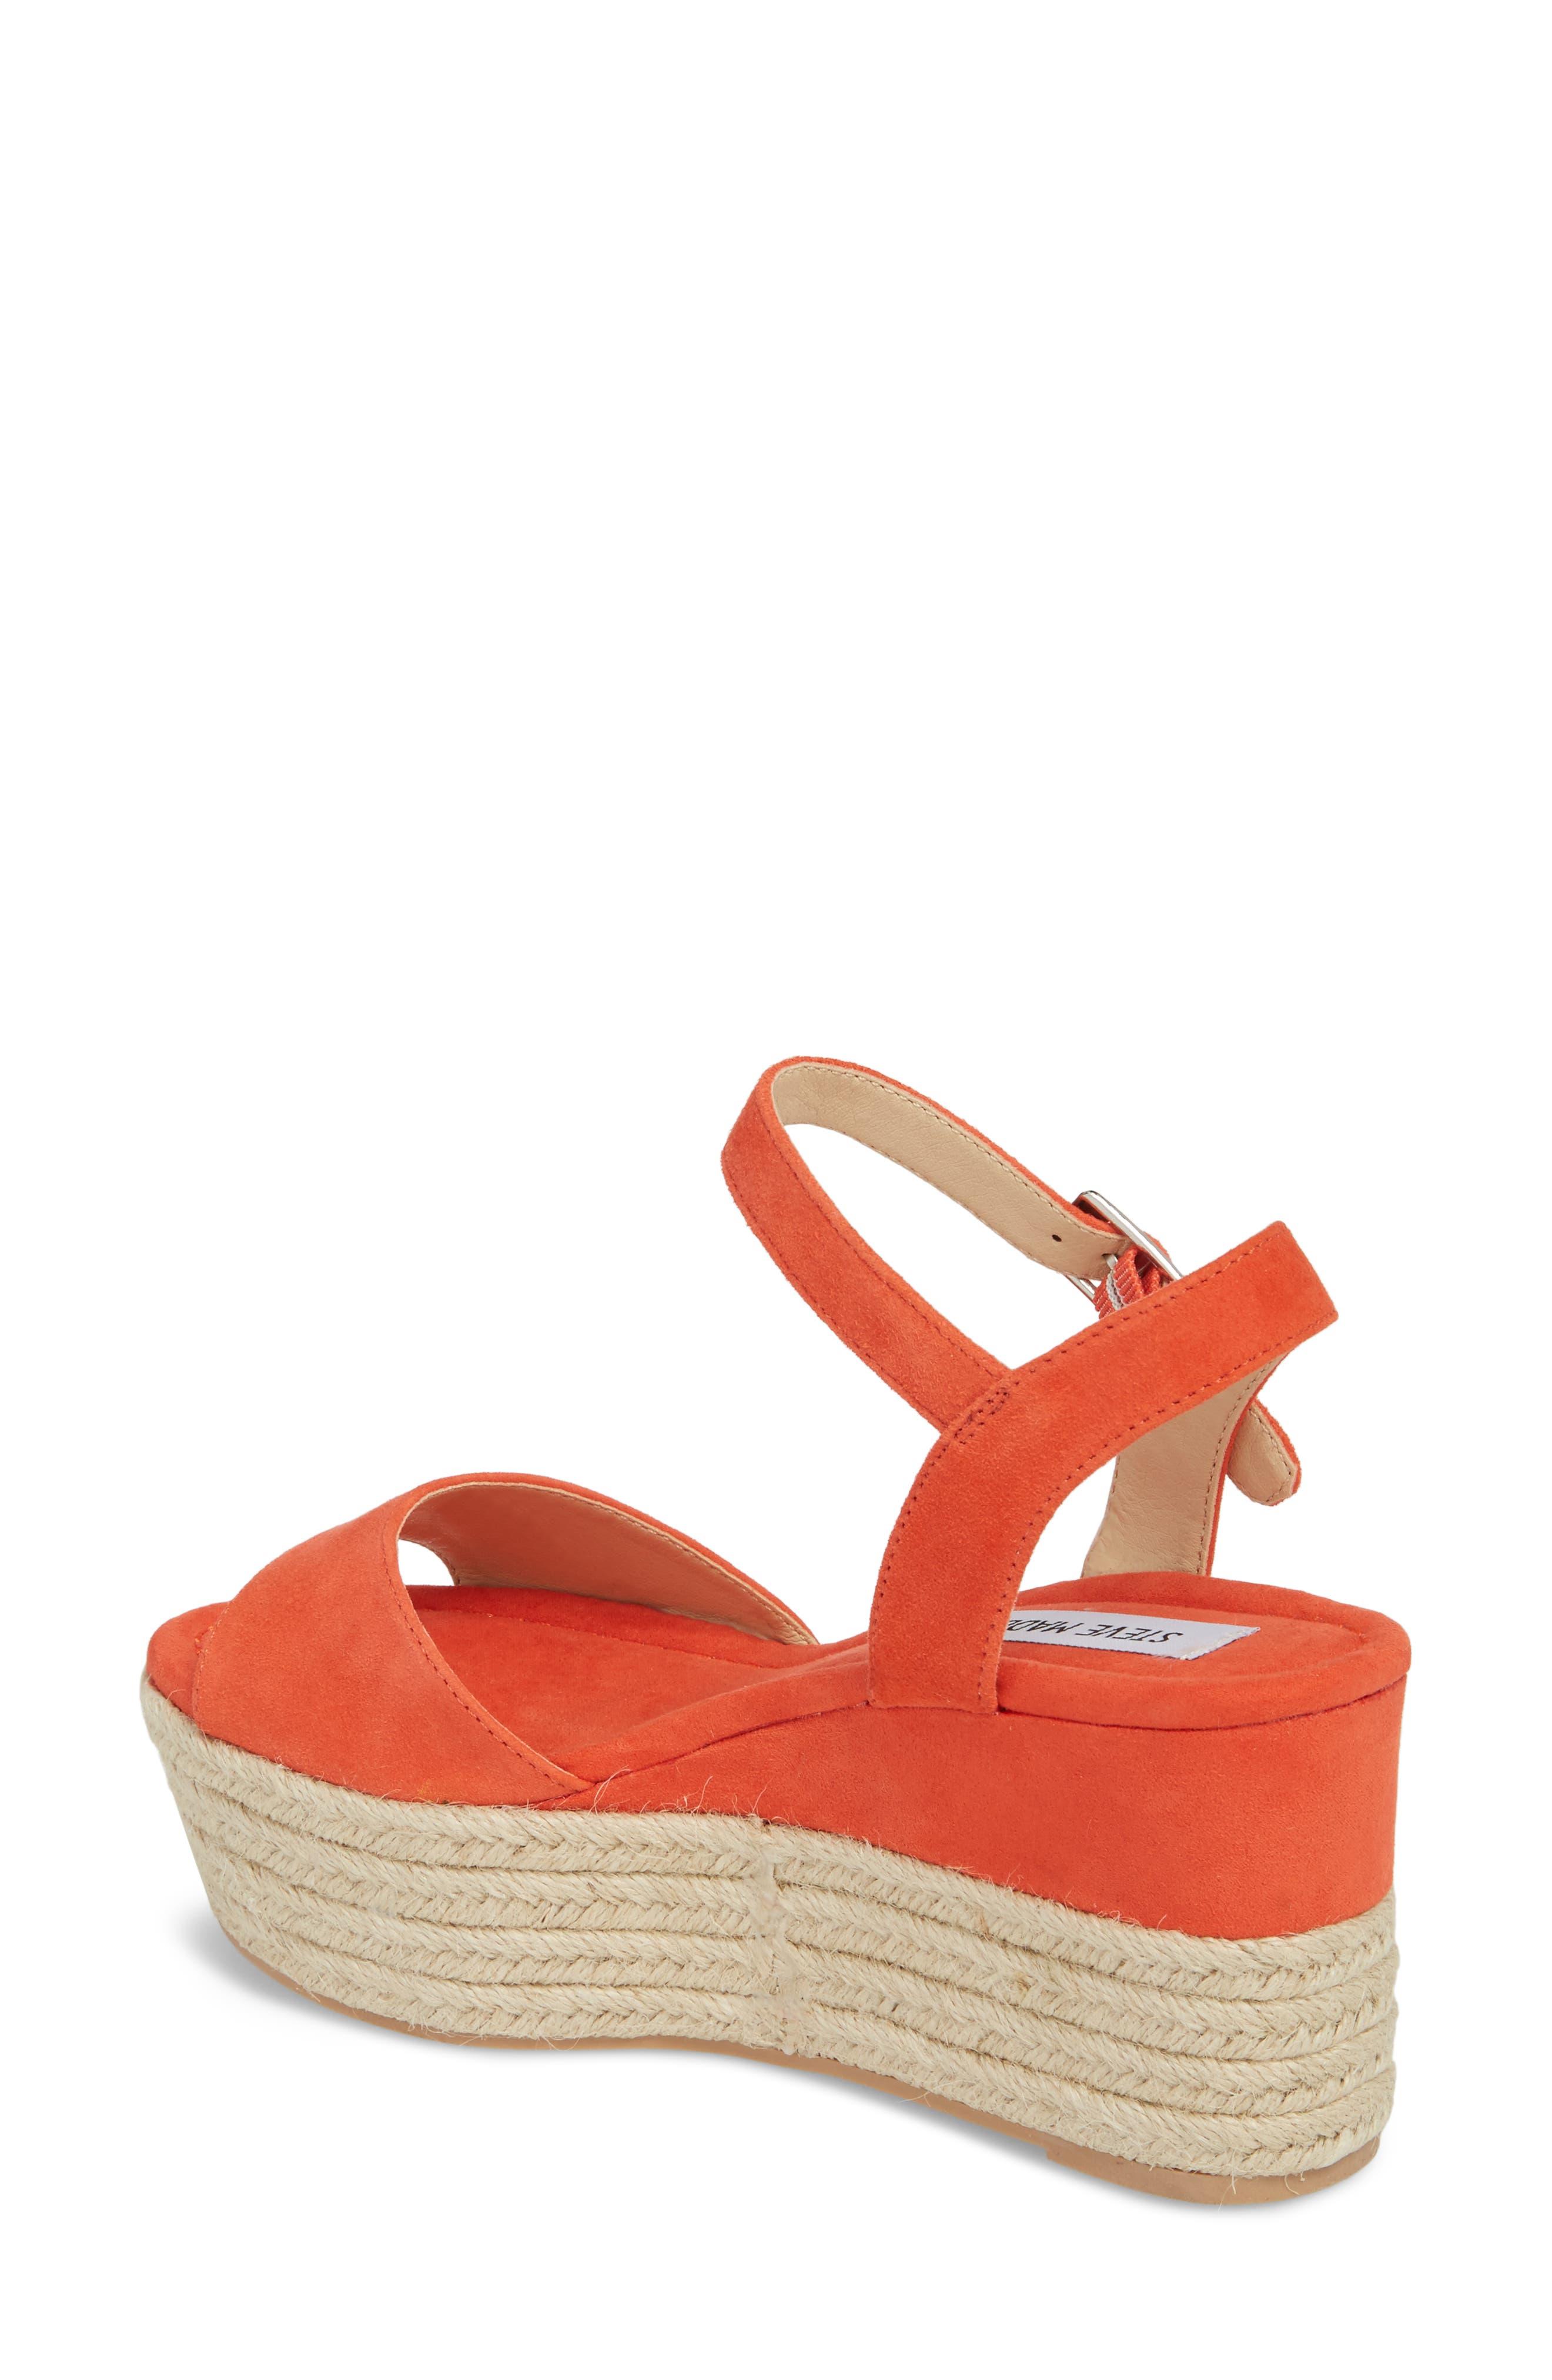 Kianna Espadrille Wedge Sandal,                             Alternate thumbnail 2, color,                             Coral Suede